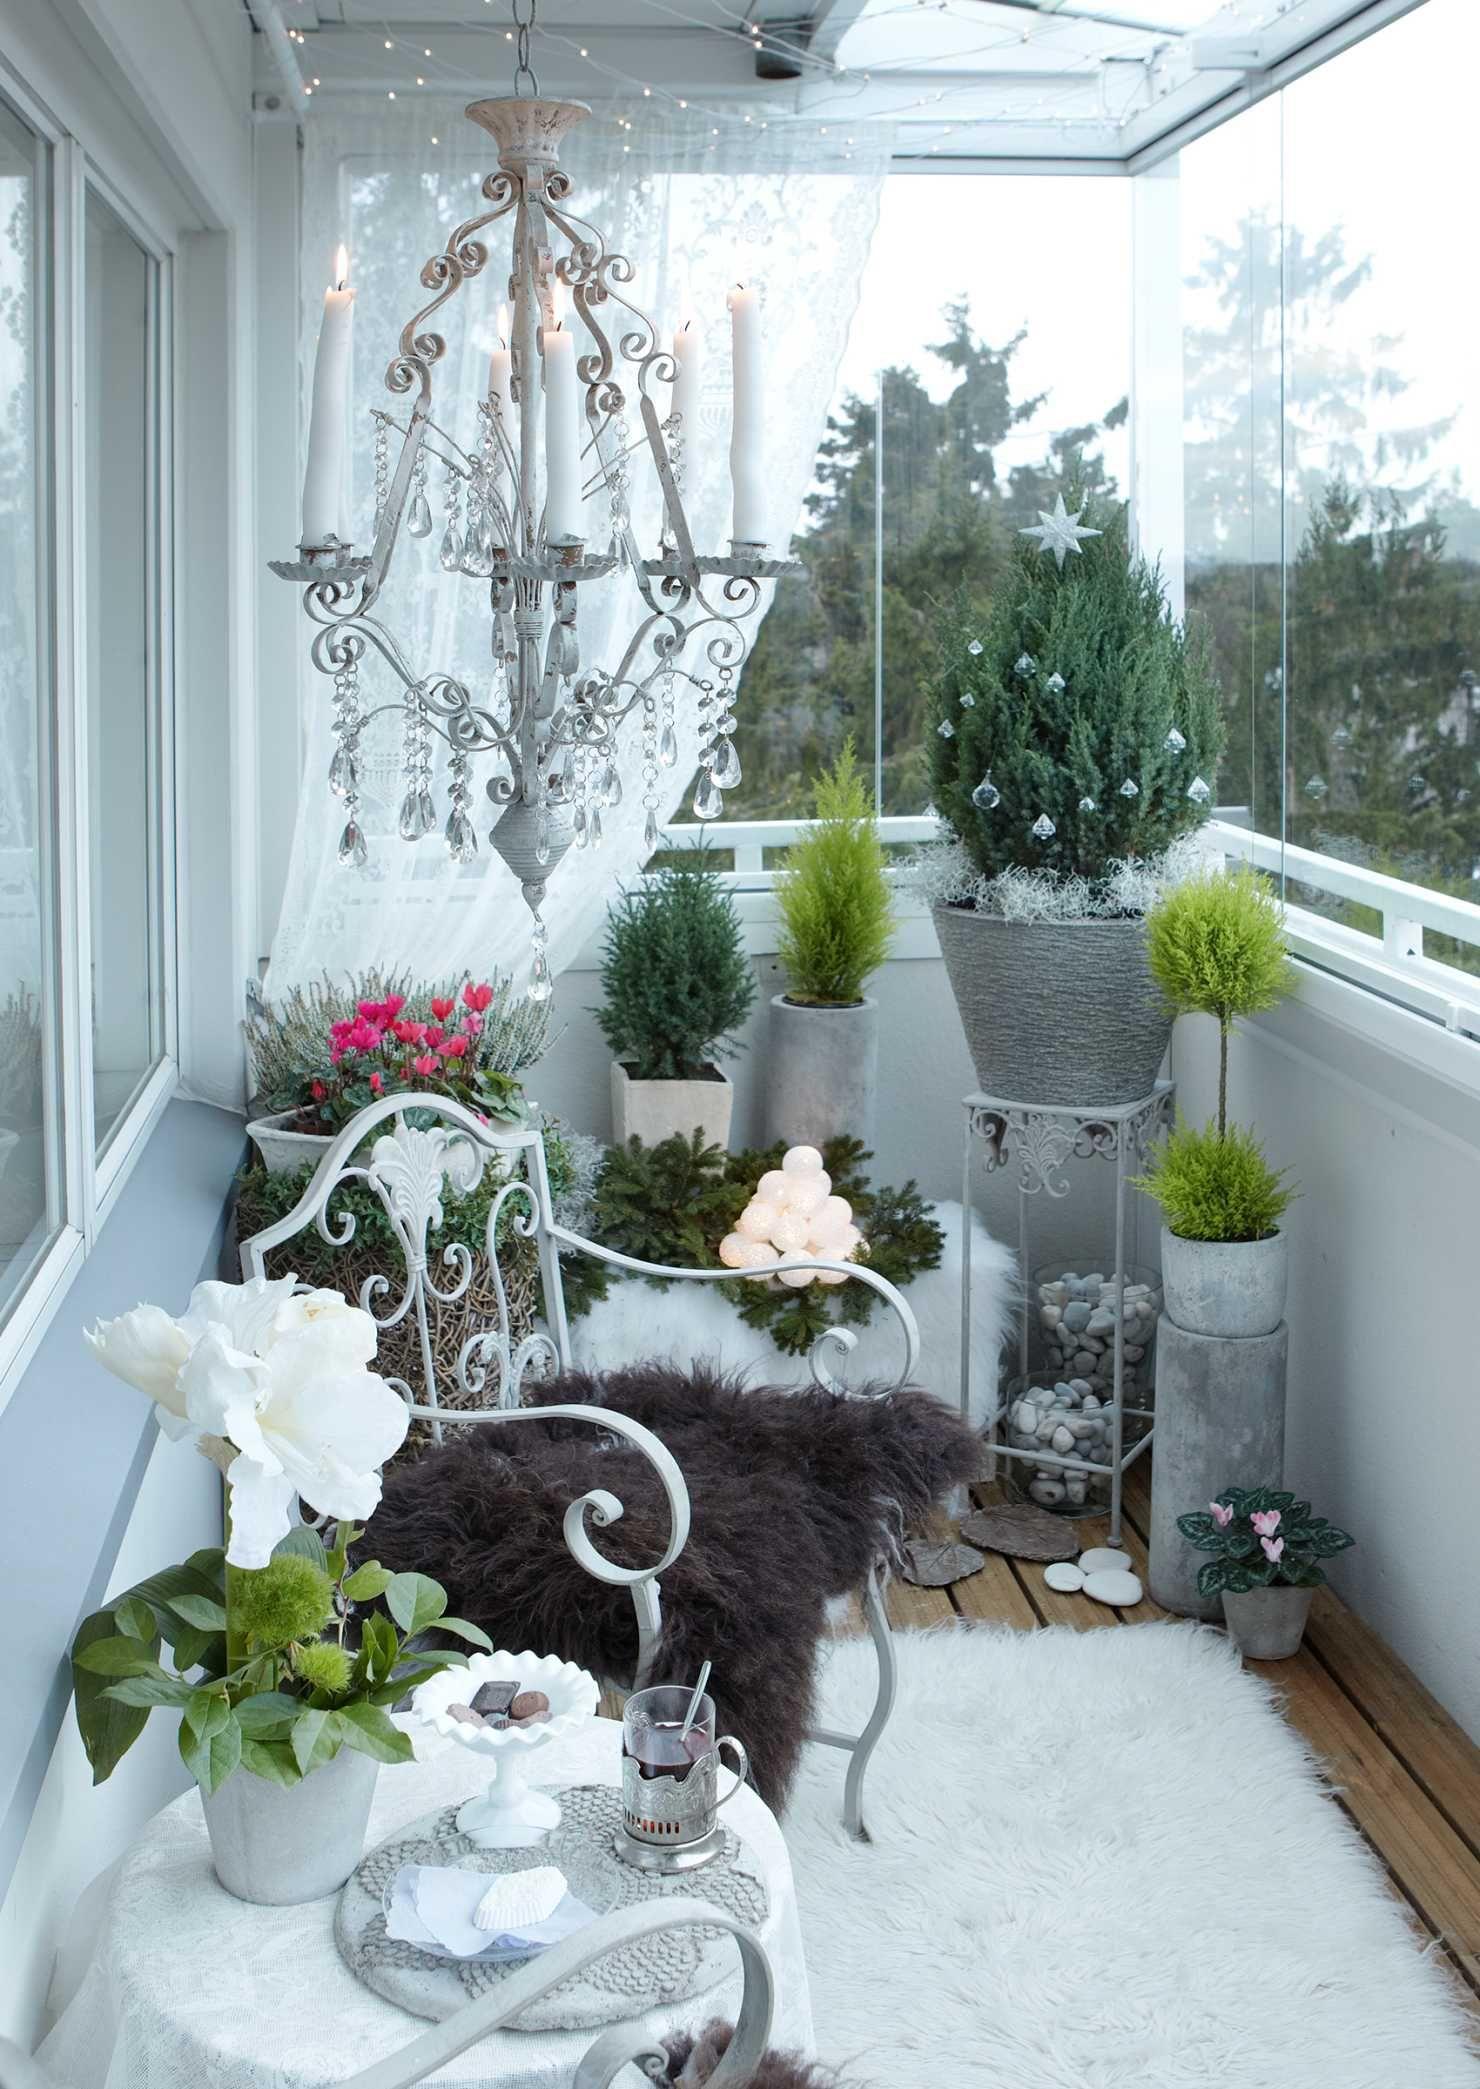 somista jouluinen parveke small balcony decor balcony decor christmas apartment on christmas balcony decorations apartment patio id=29625